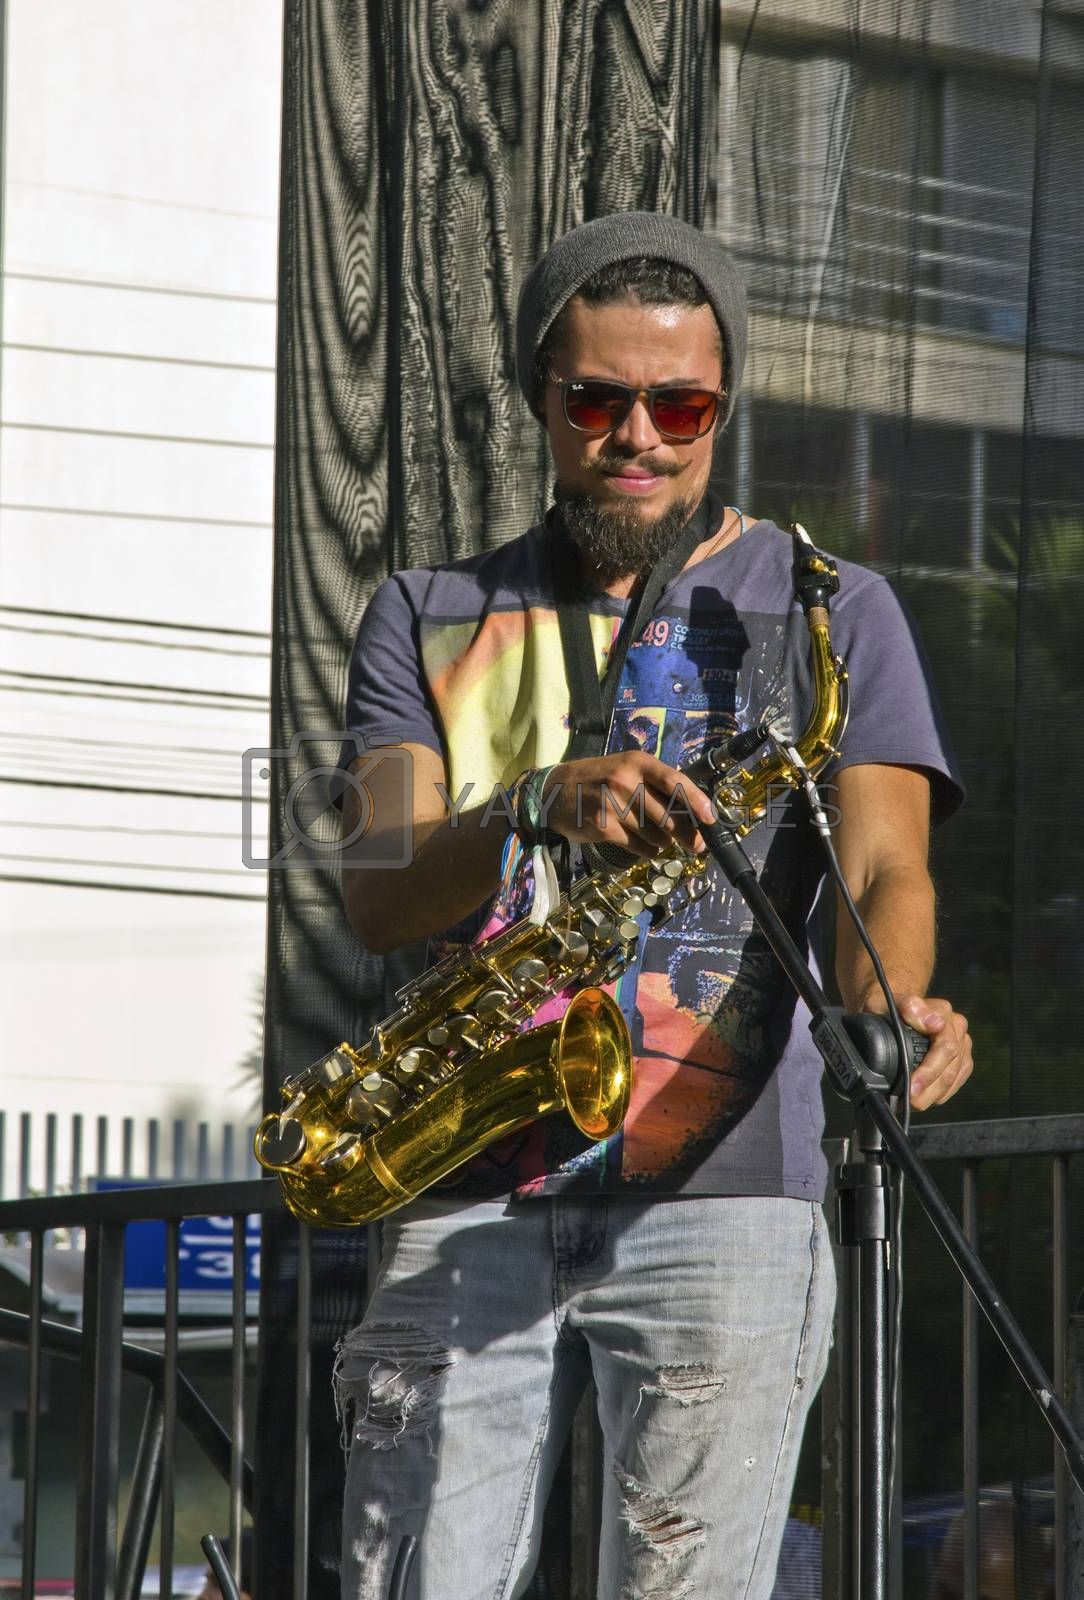 SAO PAULO, BRAZIL - MAY 17, 2015: An unidentified musician  playing saxophone on the street in Sao Paulo, Brazil.